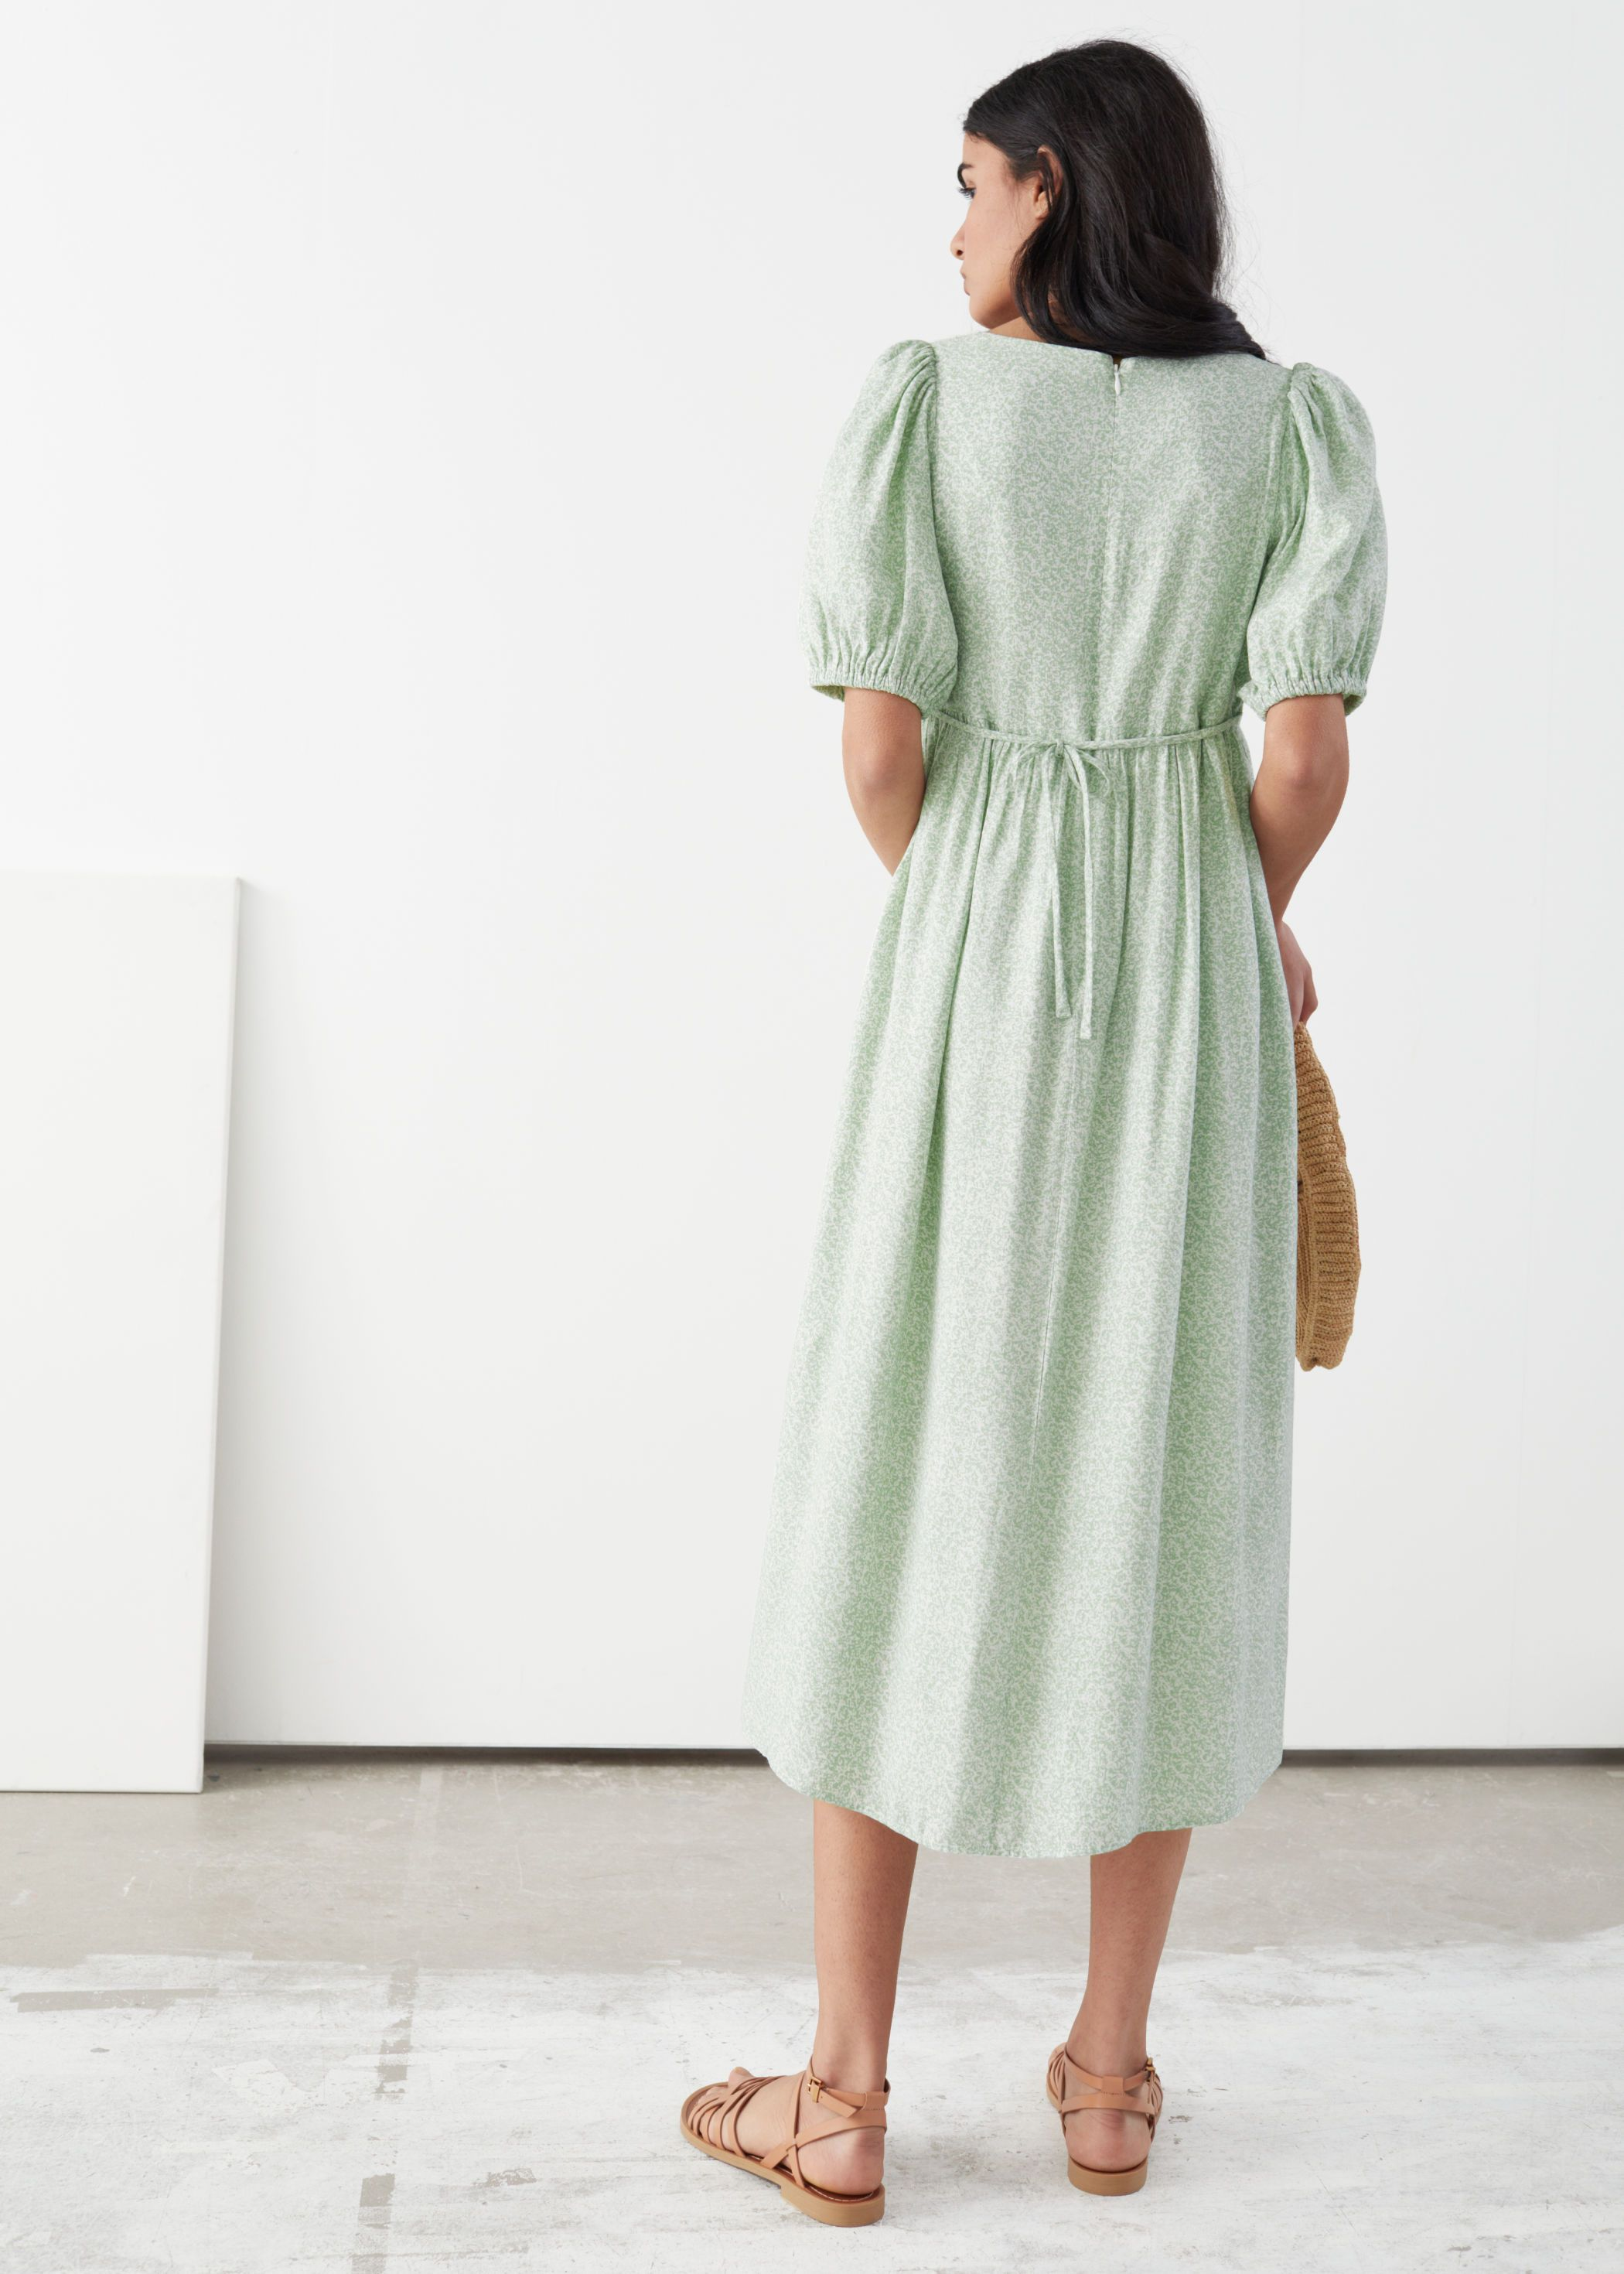 Pdp Puff Sleeve Midi Dresses Midi Dress Dresses [ 2940 x 2100 Pixel ]